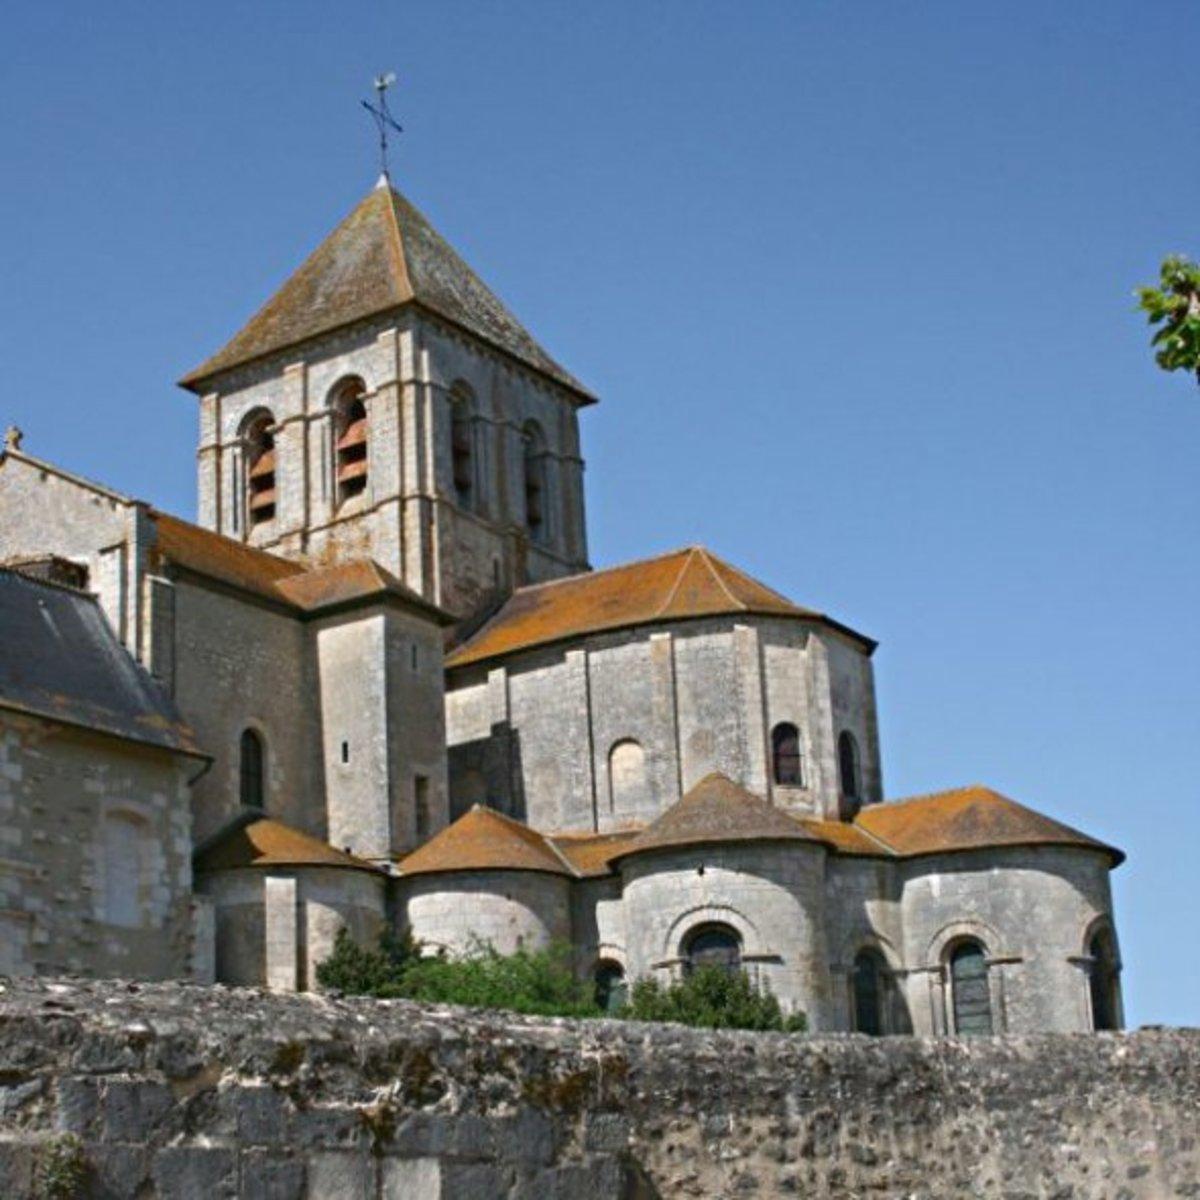 Eastern end of the abbey church in Saint-Savin